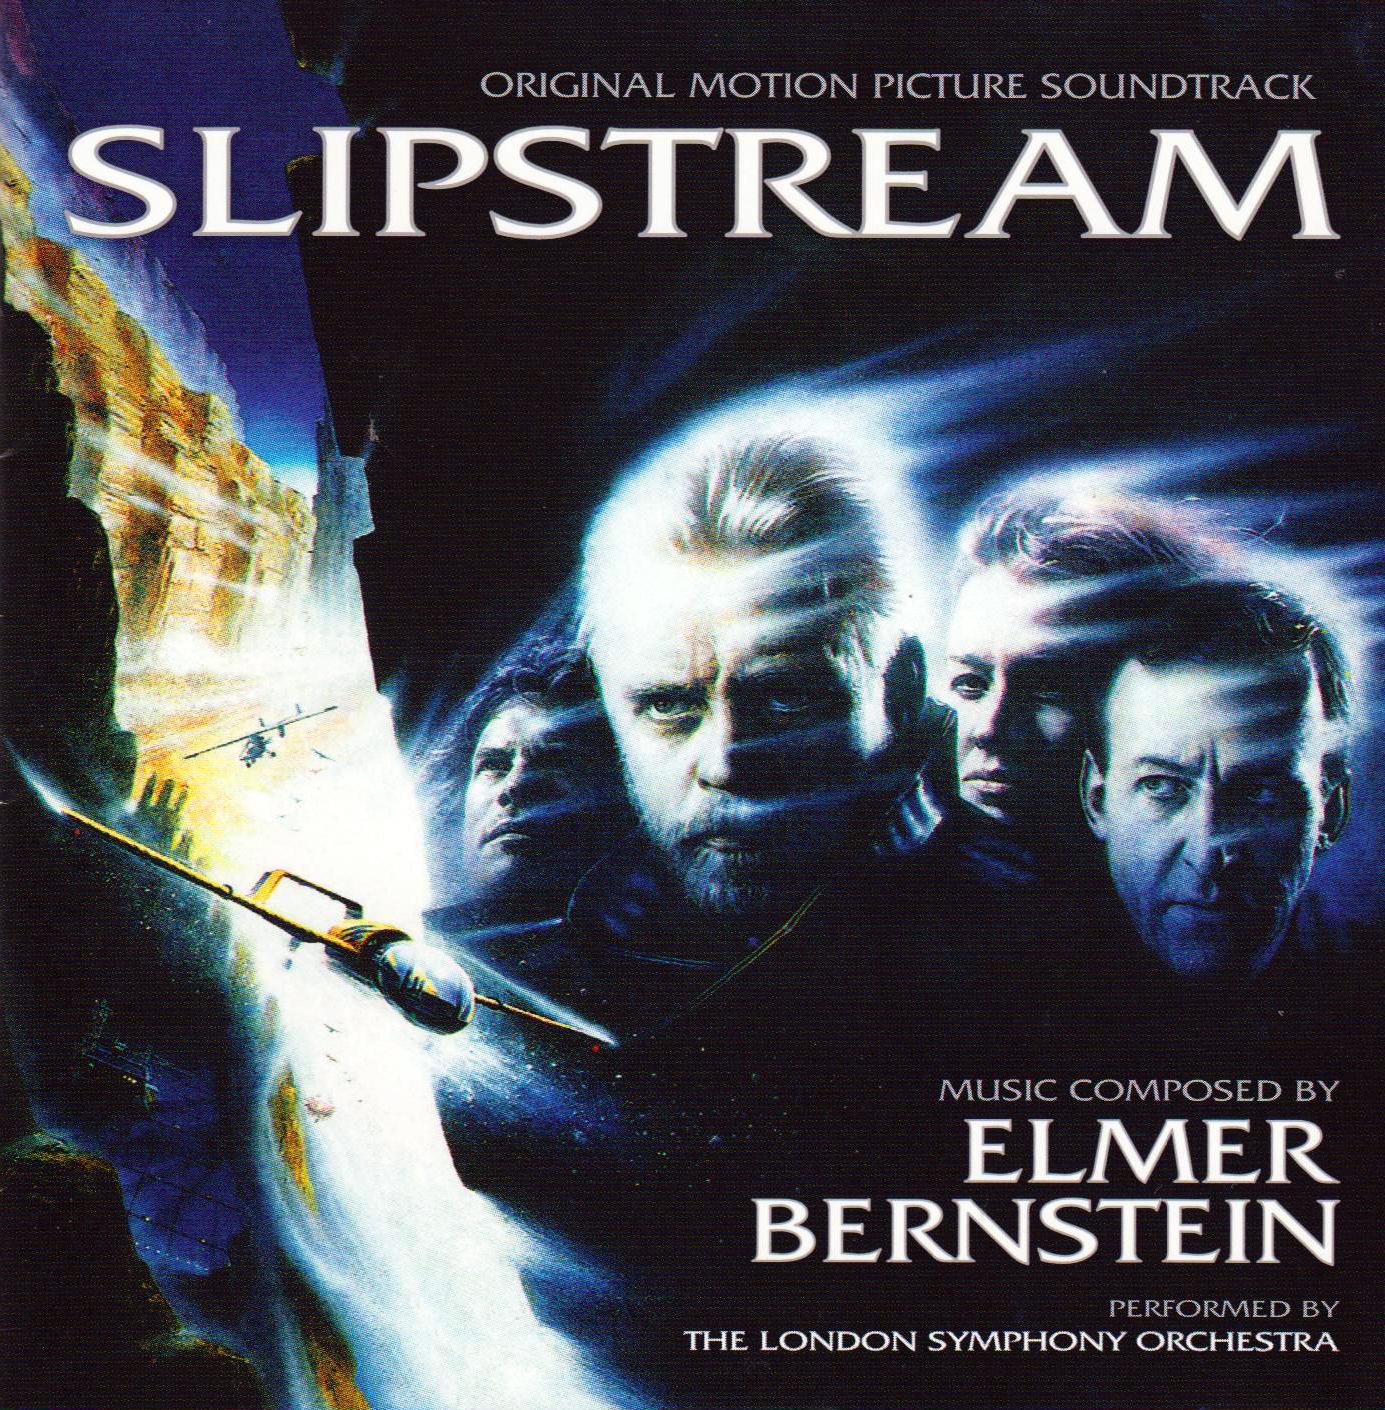 Politics And Negotiation >> Slipstream/Elmer Bernstein | Film Music: A Neglected Art